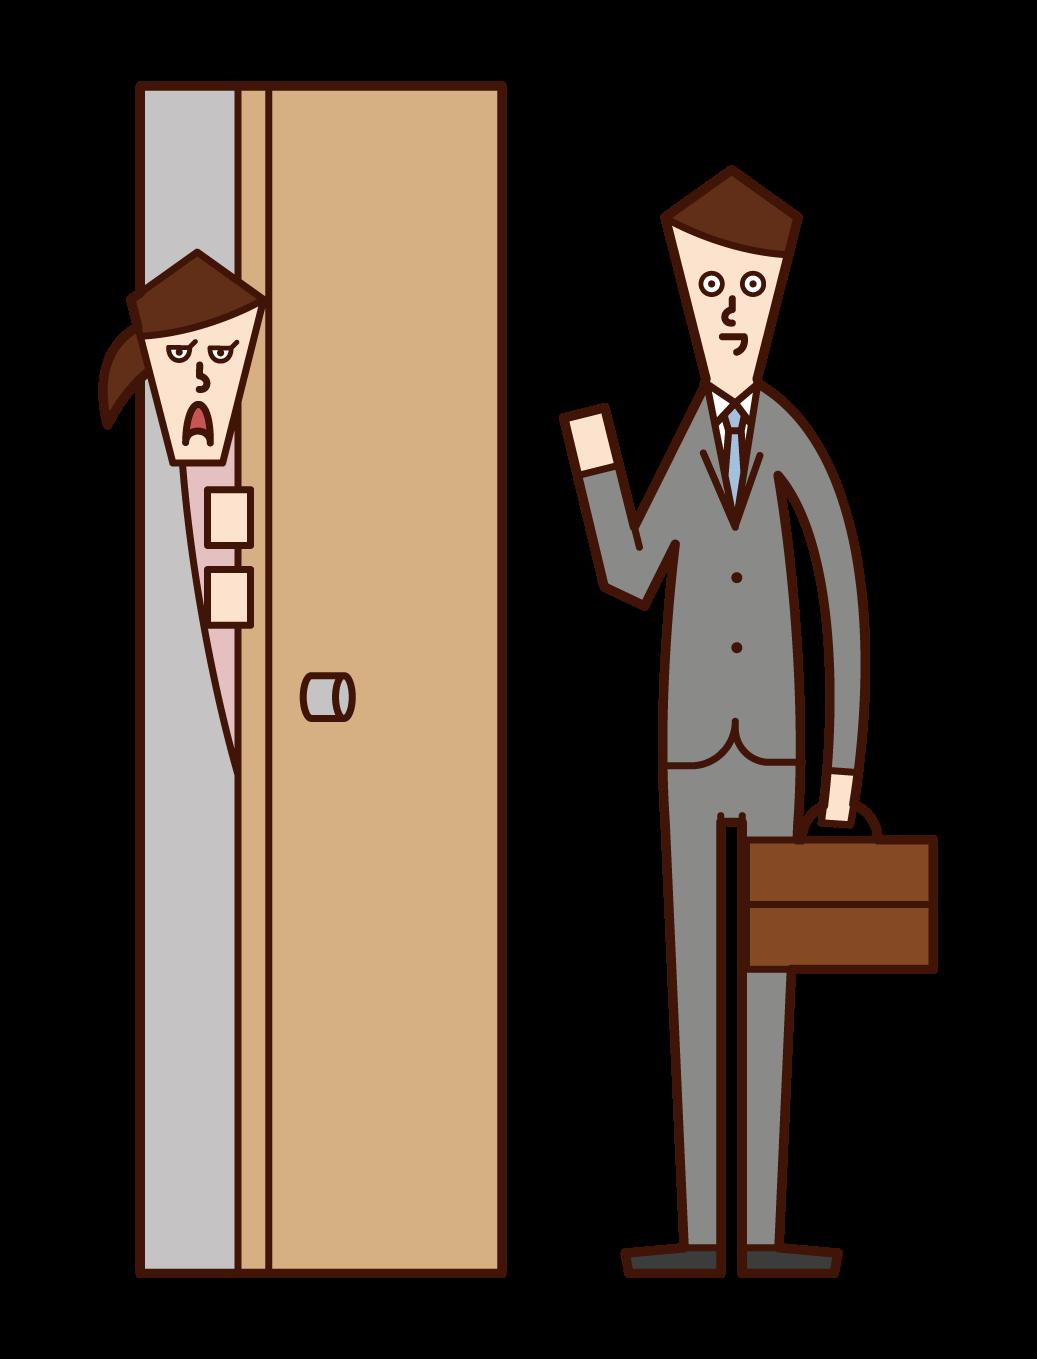 Illustration of a woman who is wary of door-to-door sales staff